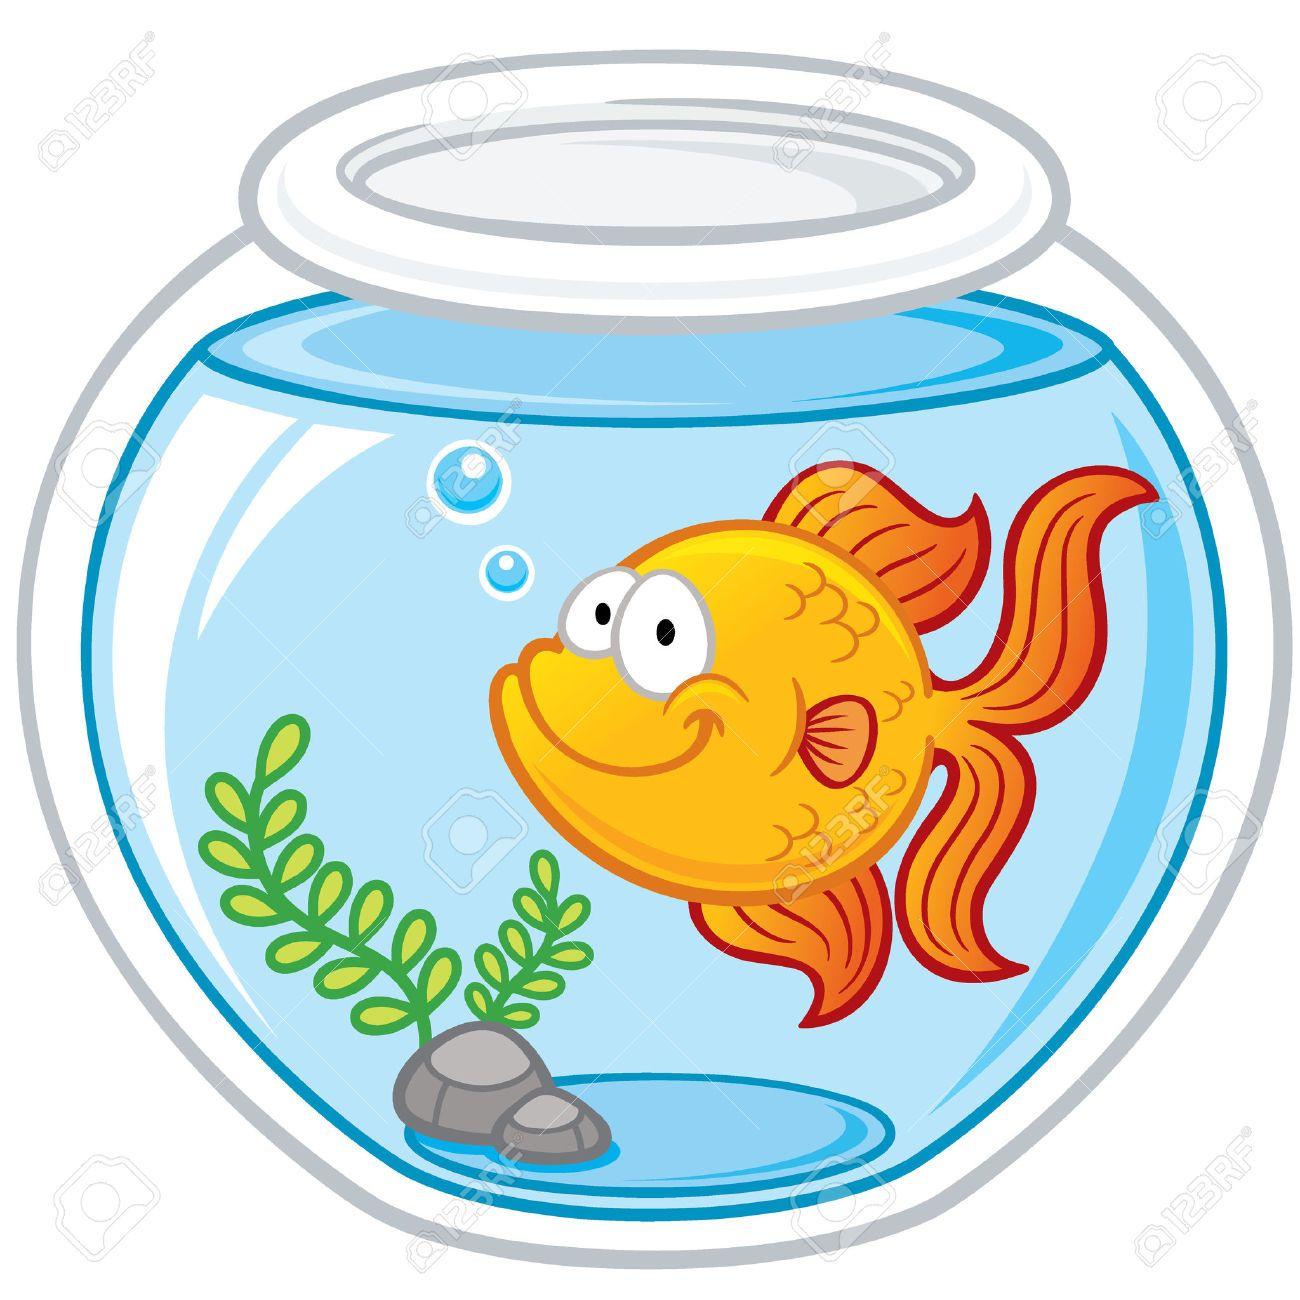 fish bowl clipart fish tank clipart goldfish bowl 2 clip art magic rh pinterest com empty fish bowl clipart fish bowl clipart free